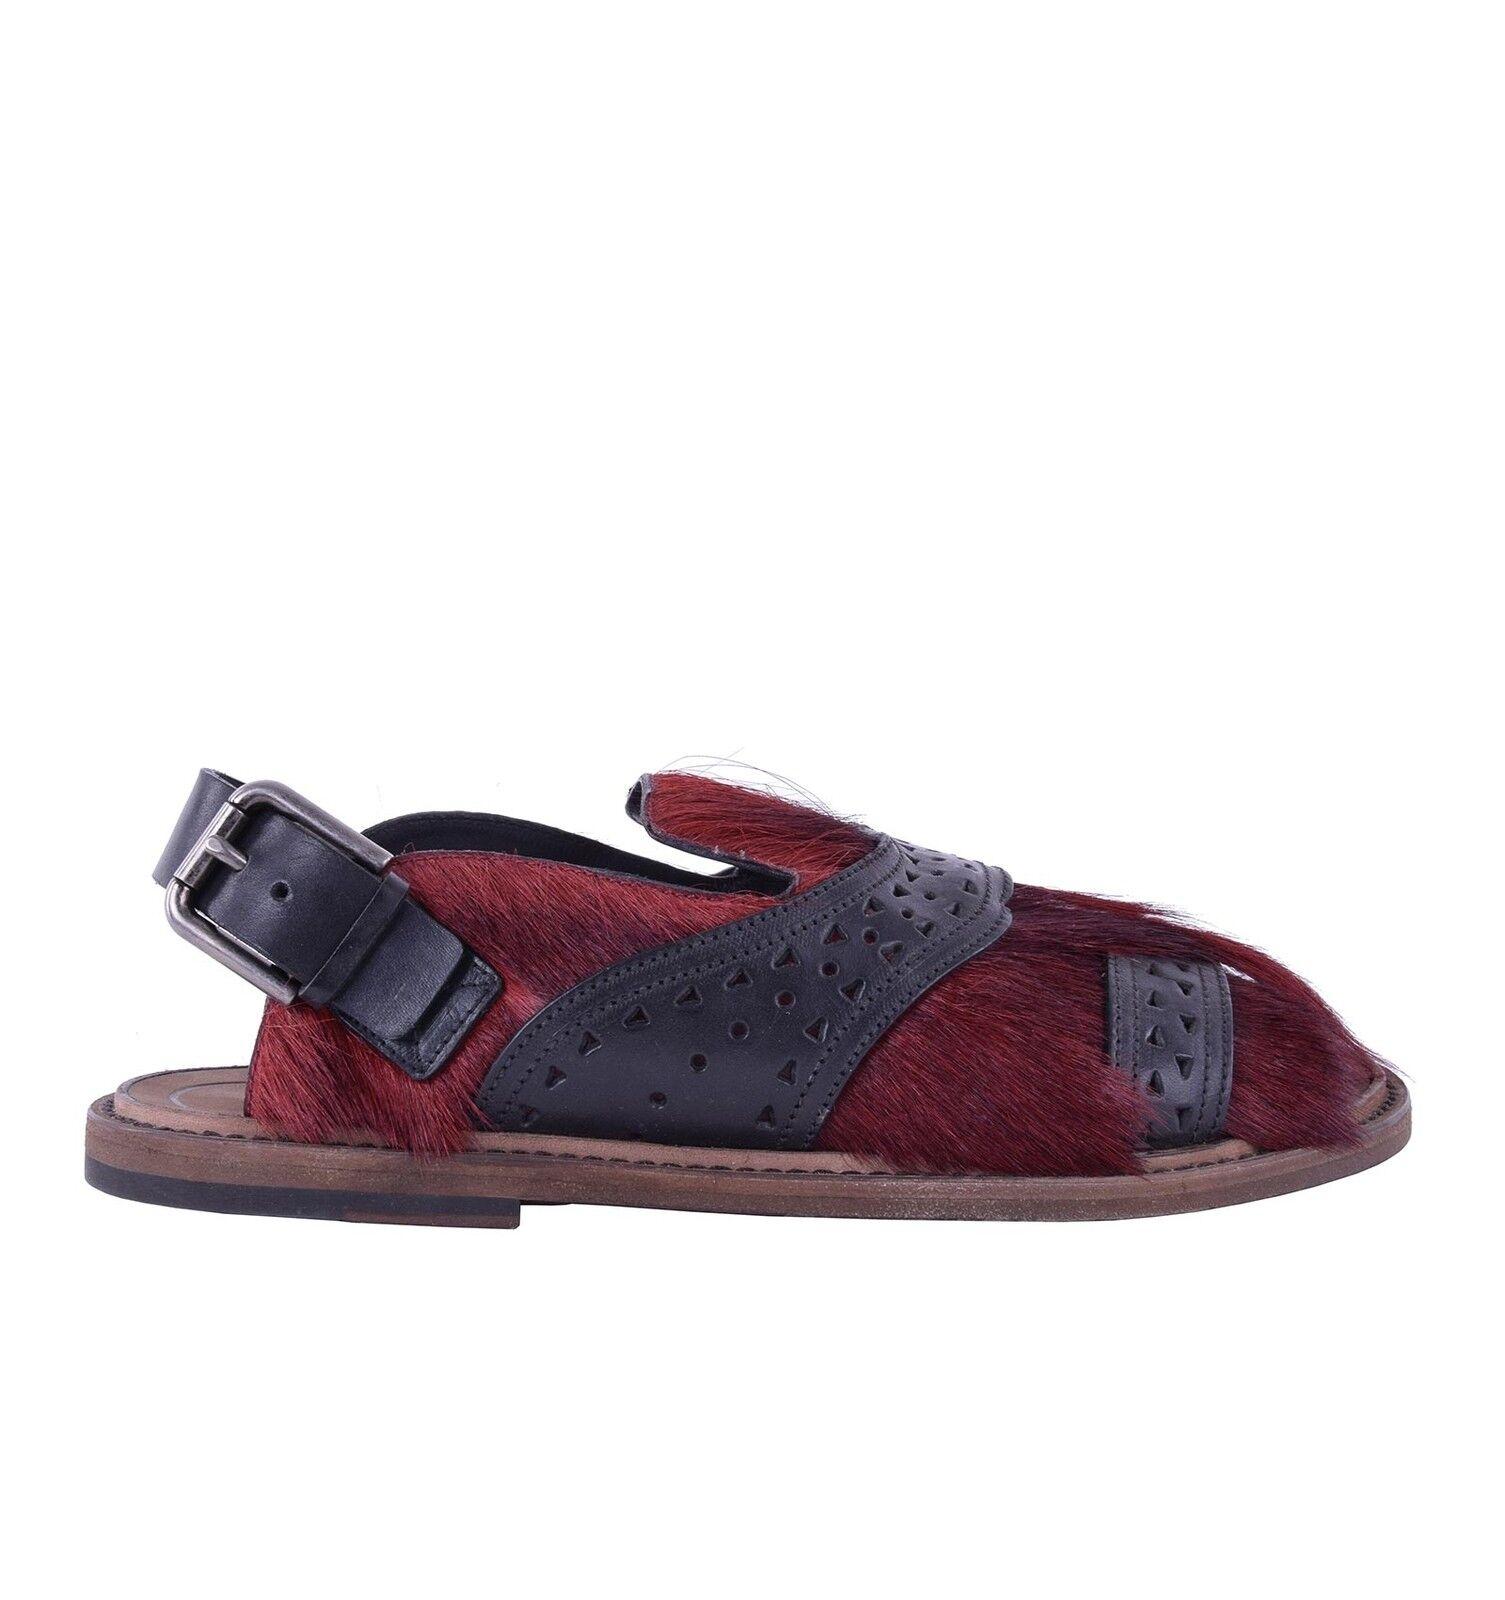 DOLCE & GABBANA Pelz Sandalen Schuhe VESUVIO Rot Schwarz Fur Sandals 05226